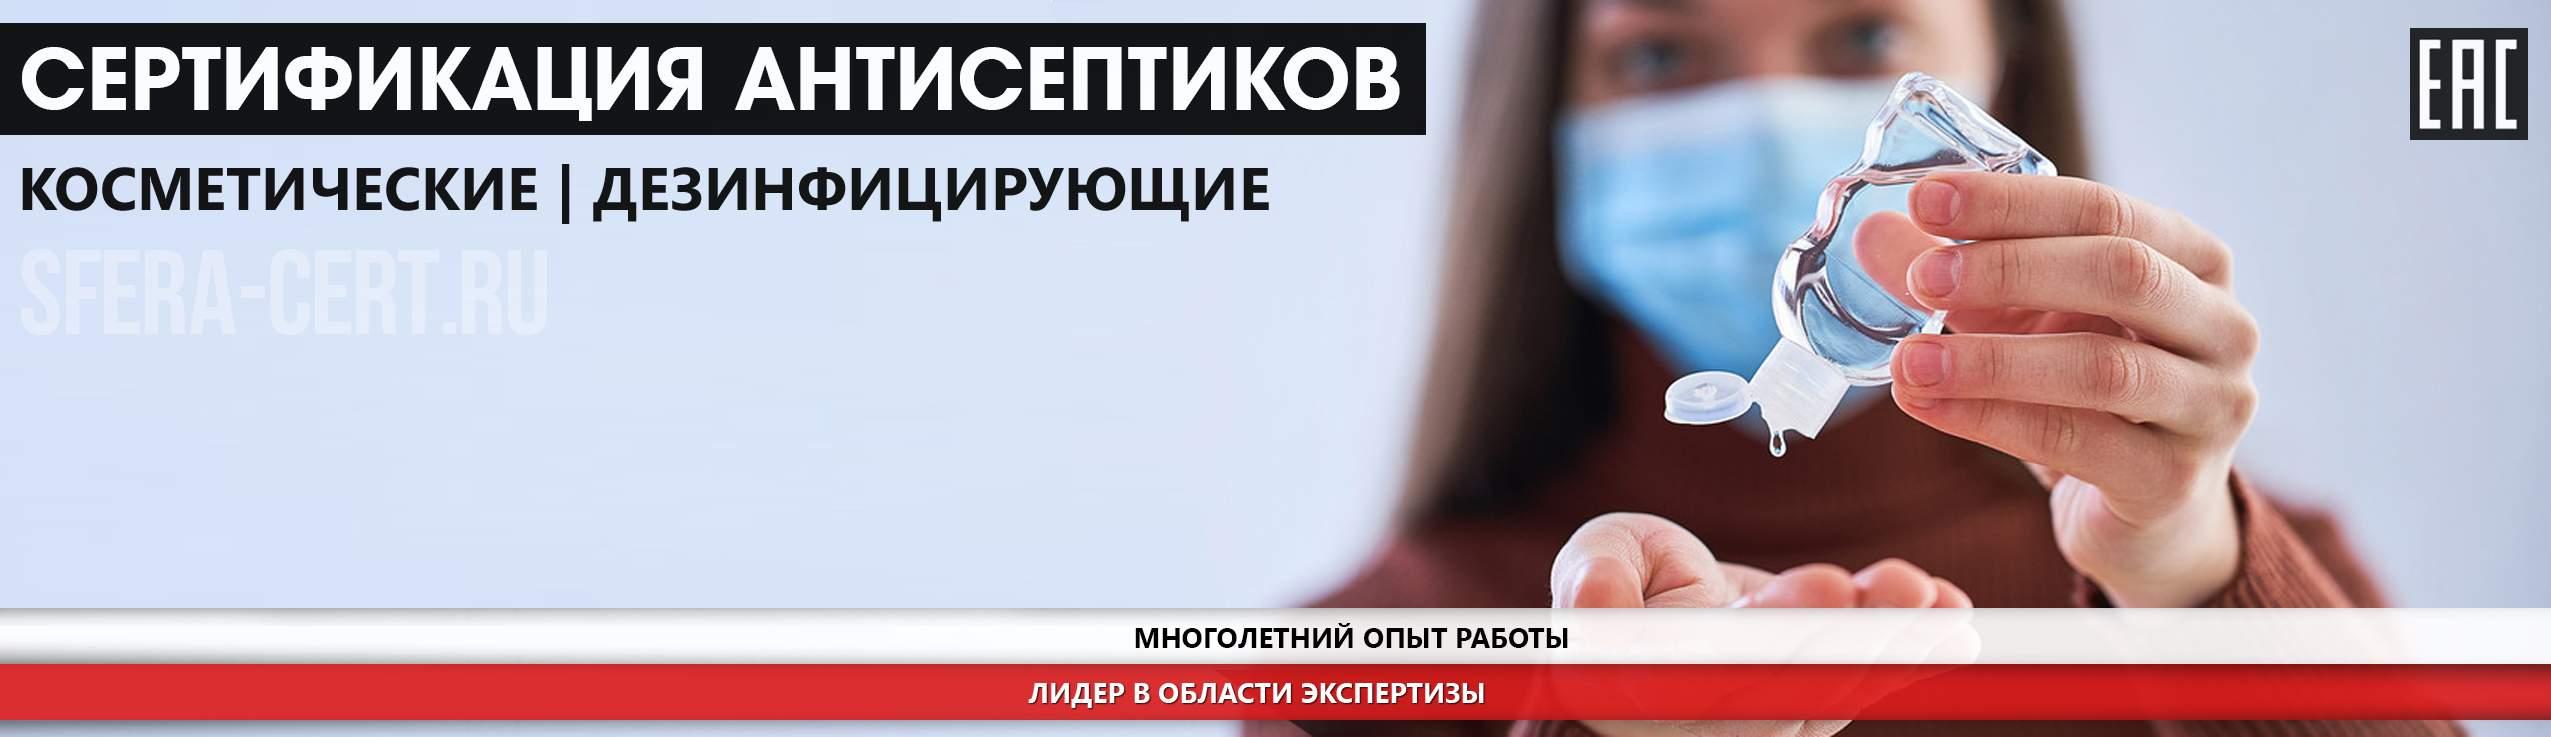 Сертификация антисептиков баннер